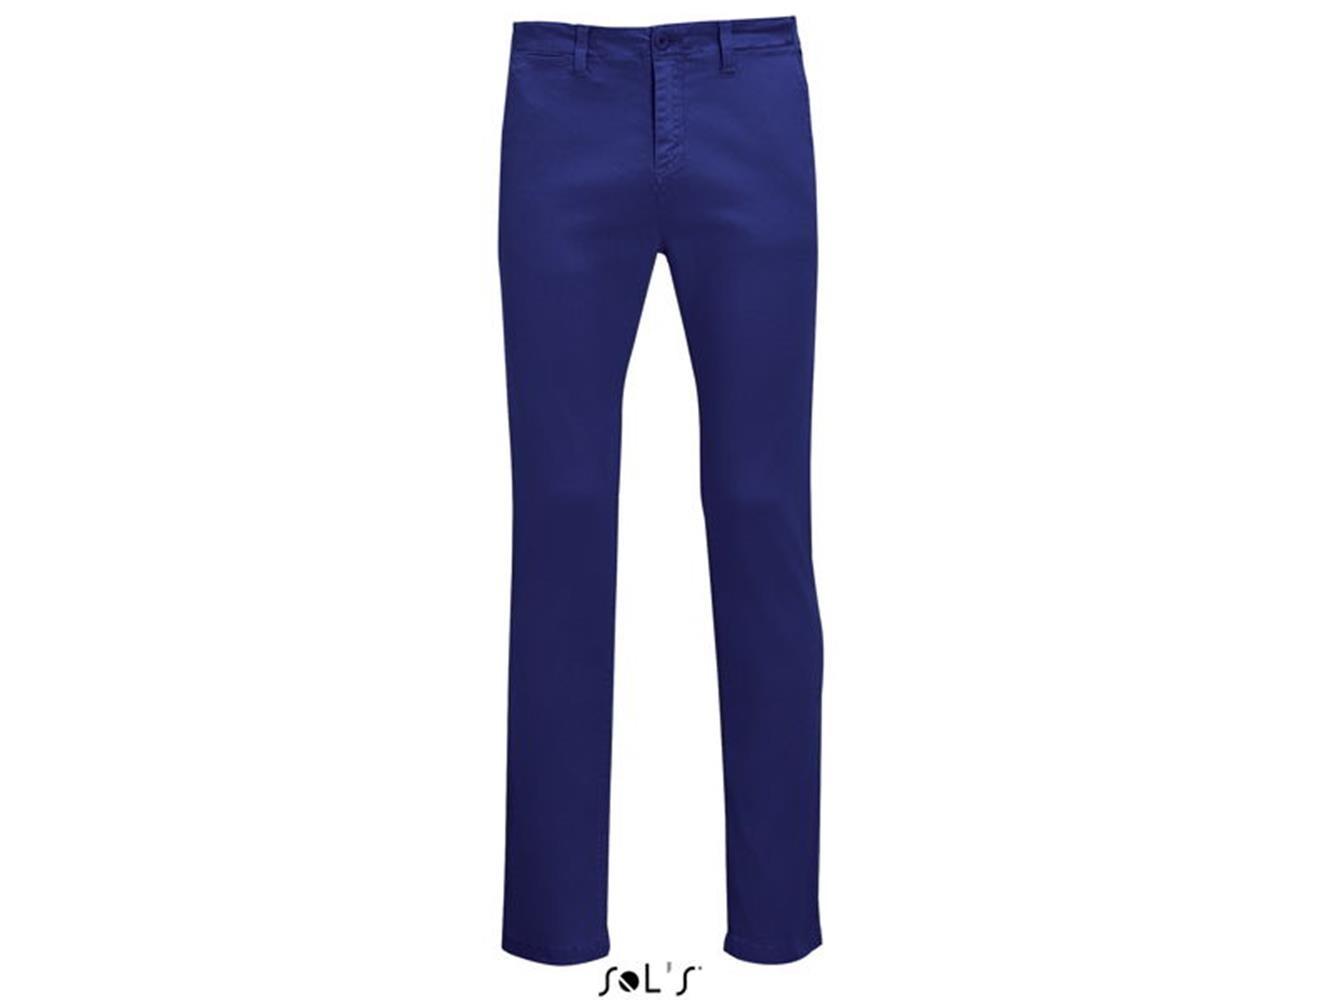 Ricamo Del Sols Uomo Pantalone Atelier Jules Men H9E2IDeWY